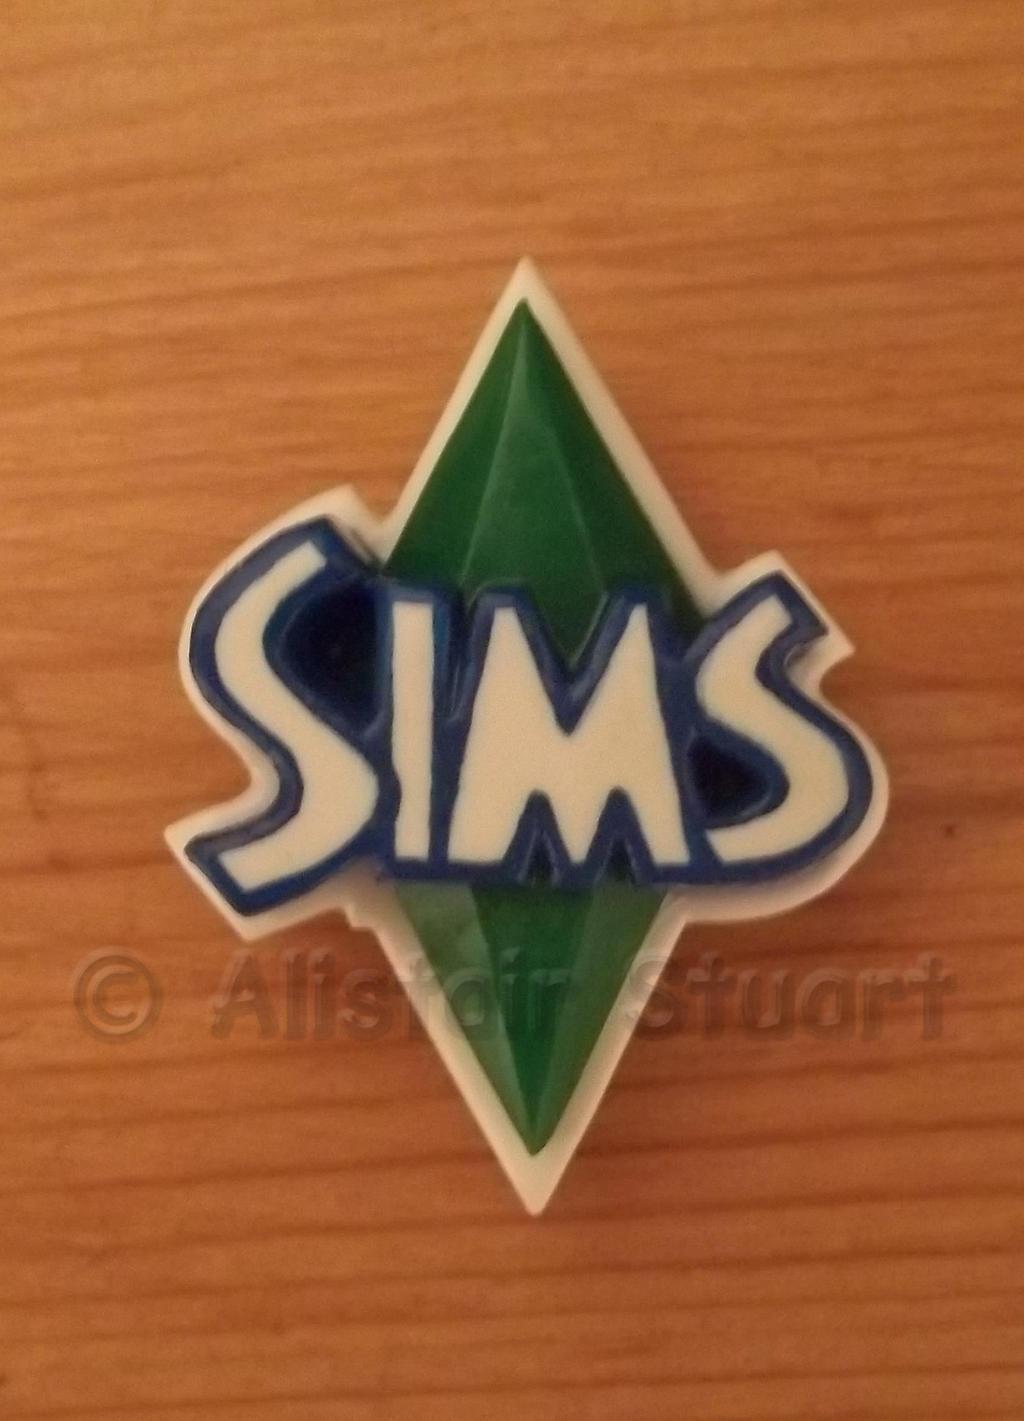 Sims Logo Plumbob Badge